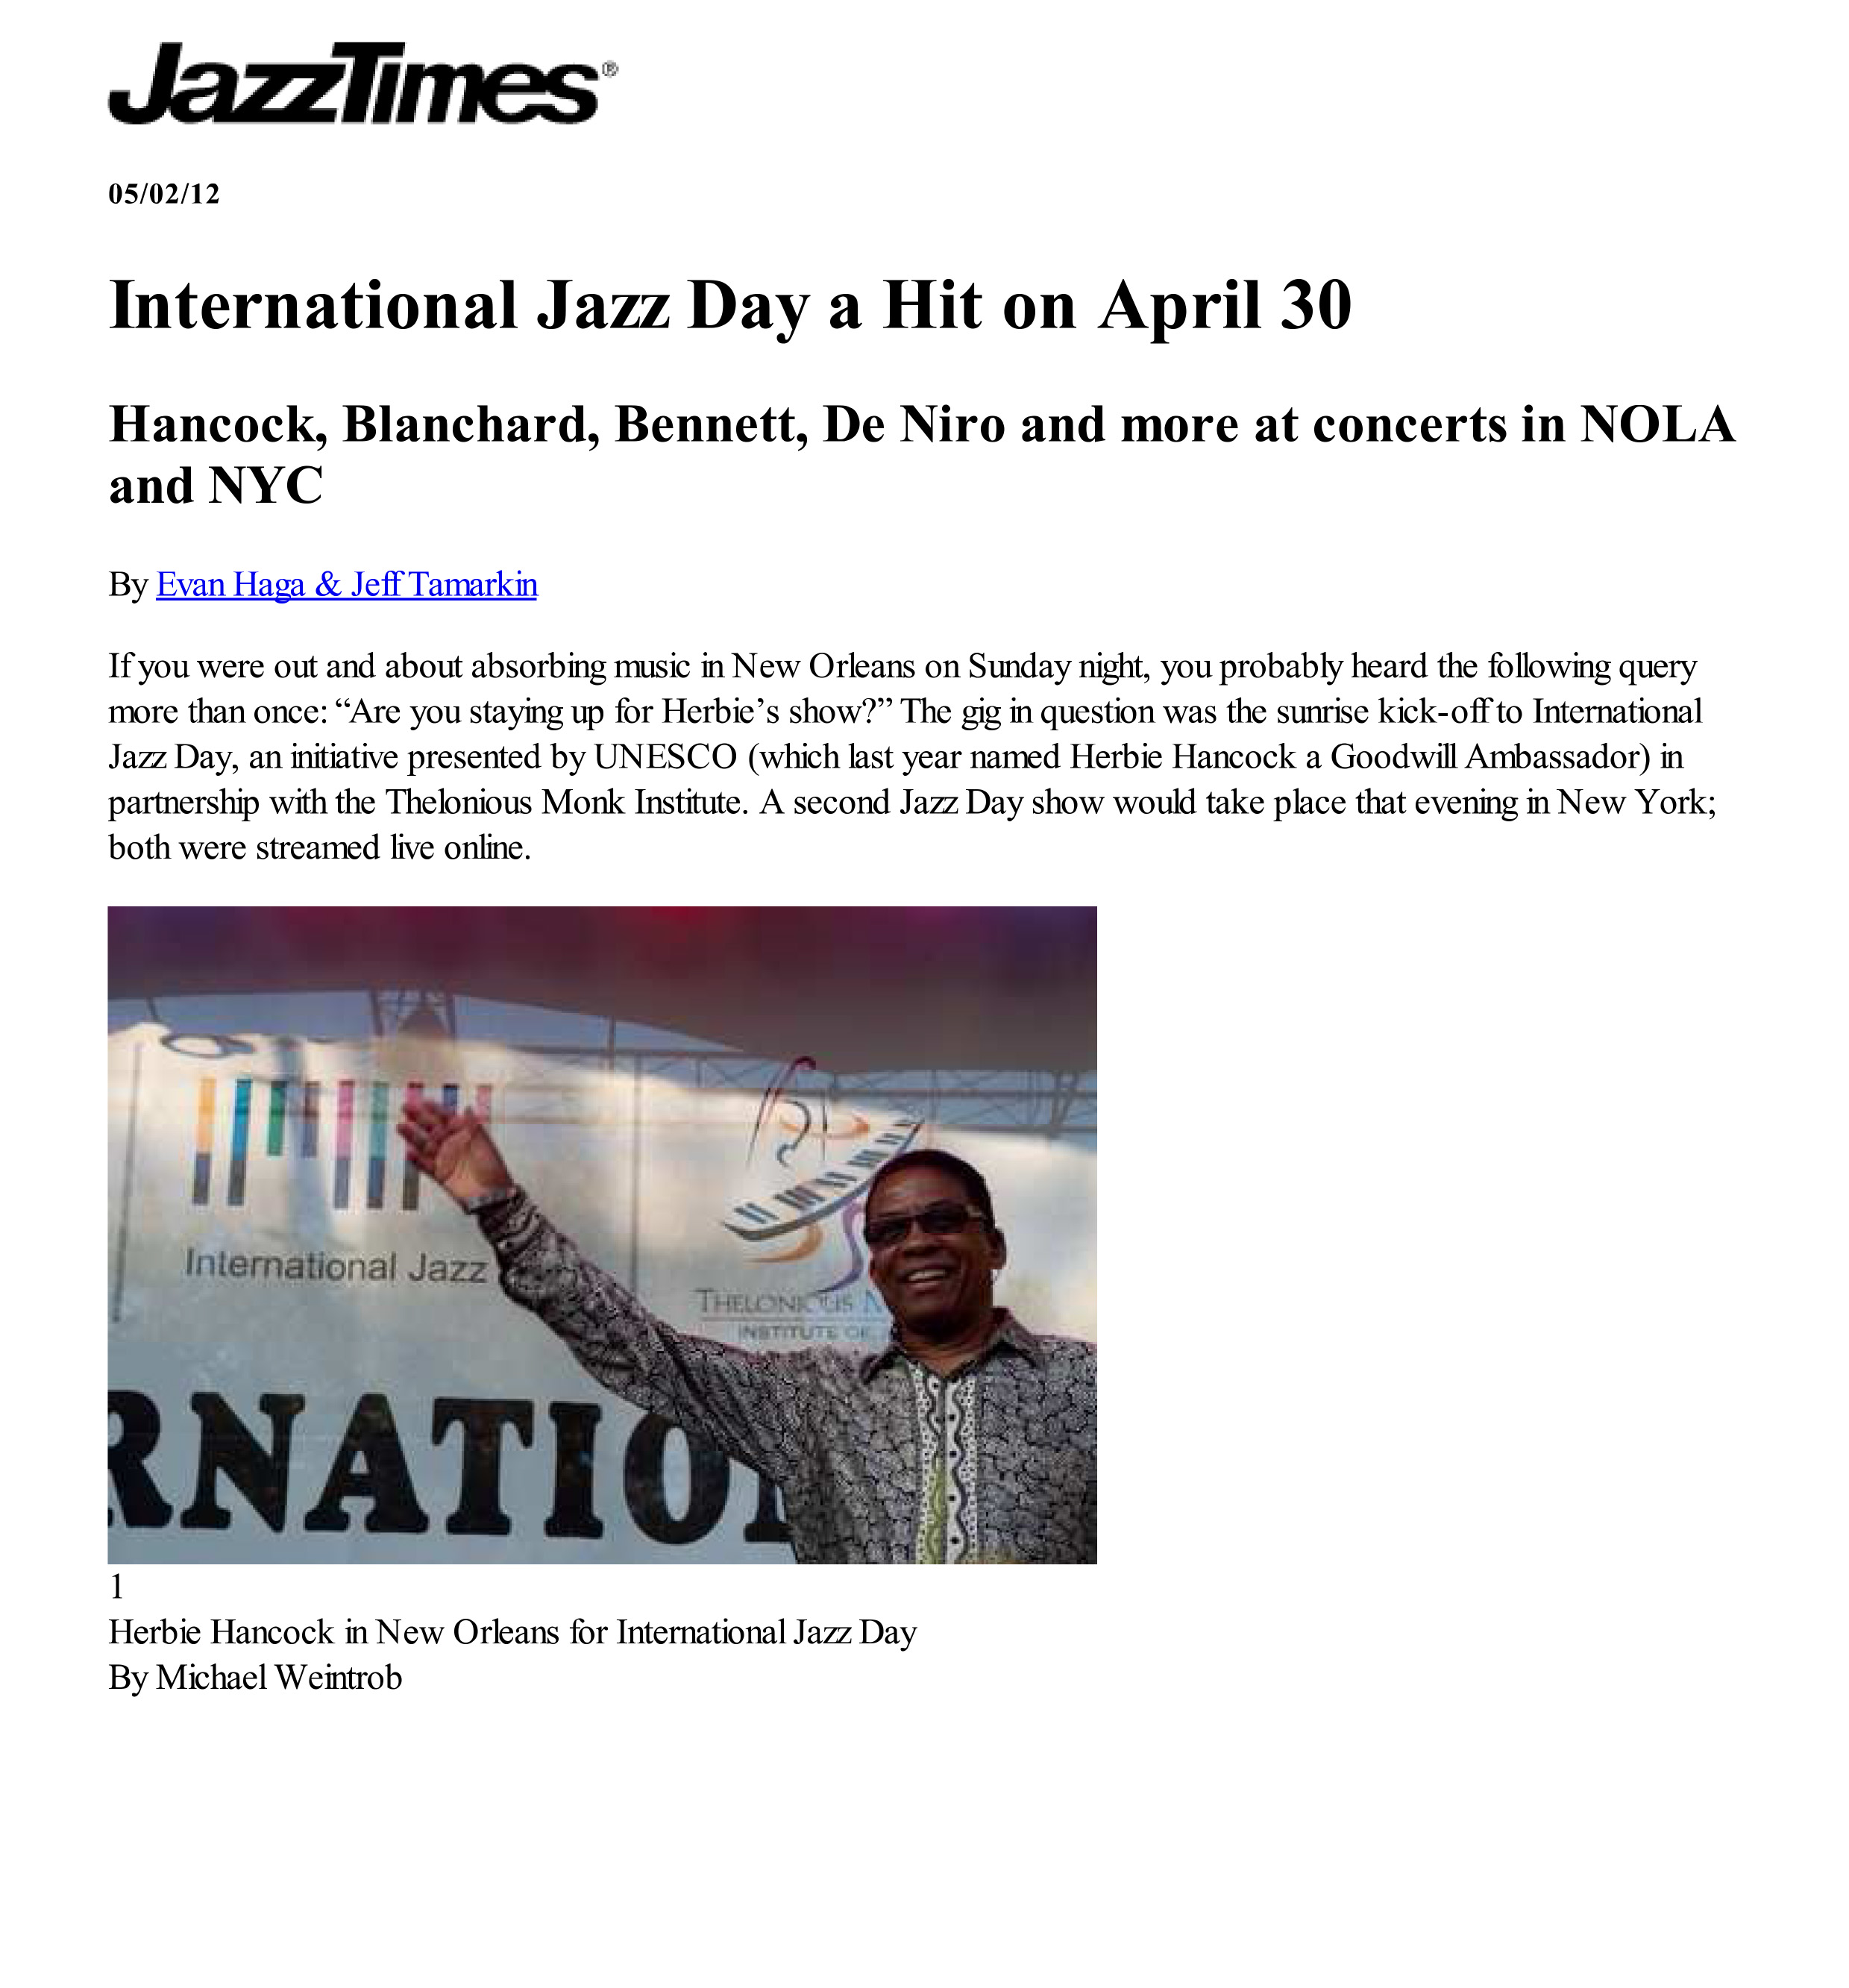 Jazz Times  / 02 May 2012 / Evan Haga & Jeff Tamarkin -  International Jazz Day A Hit on April 30